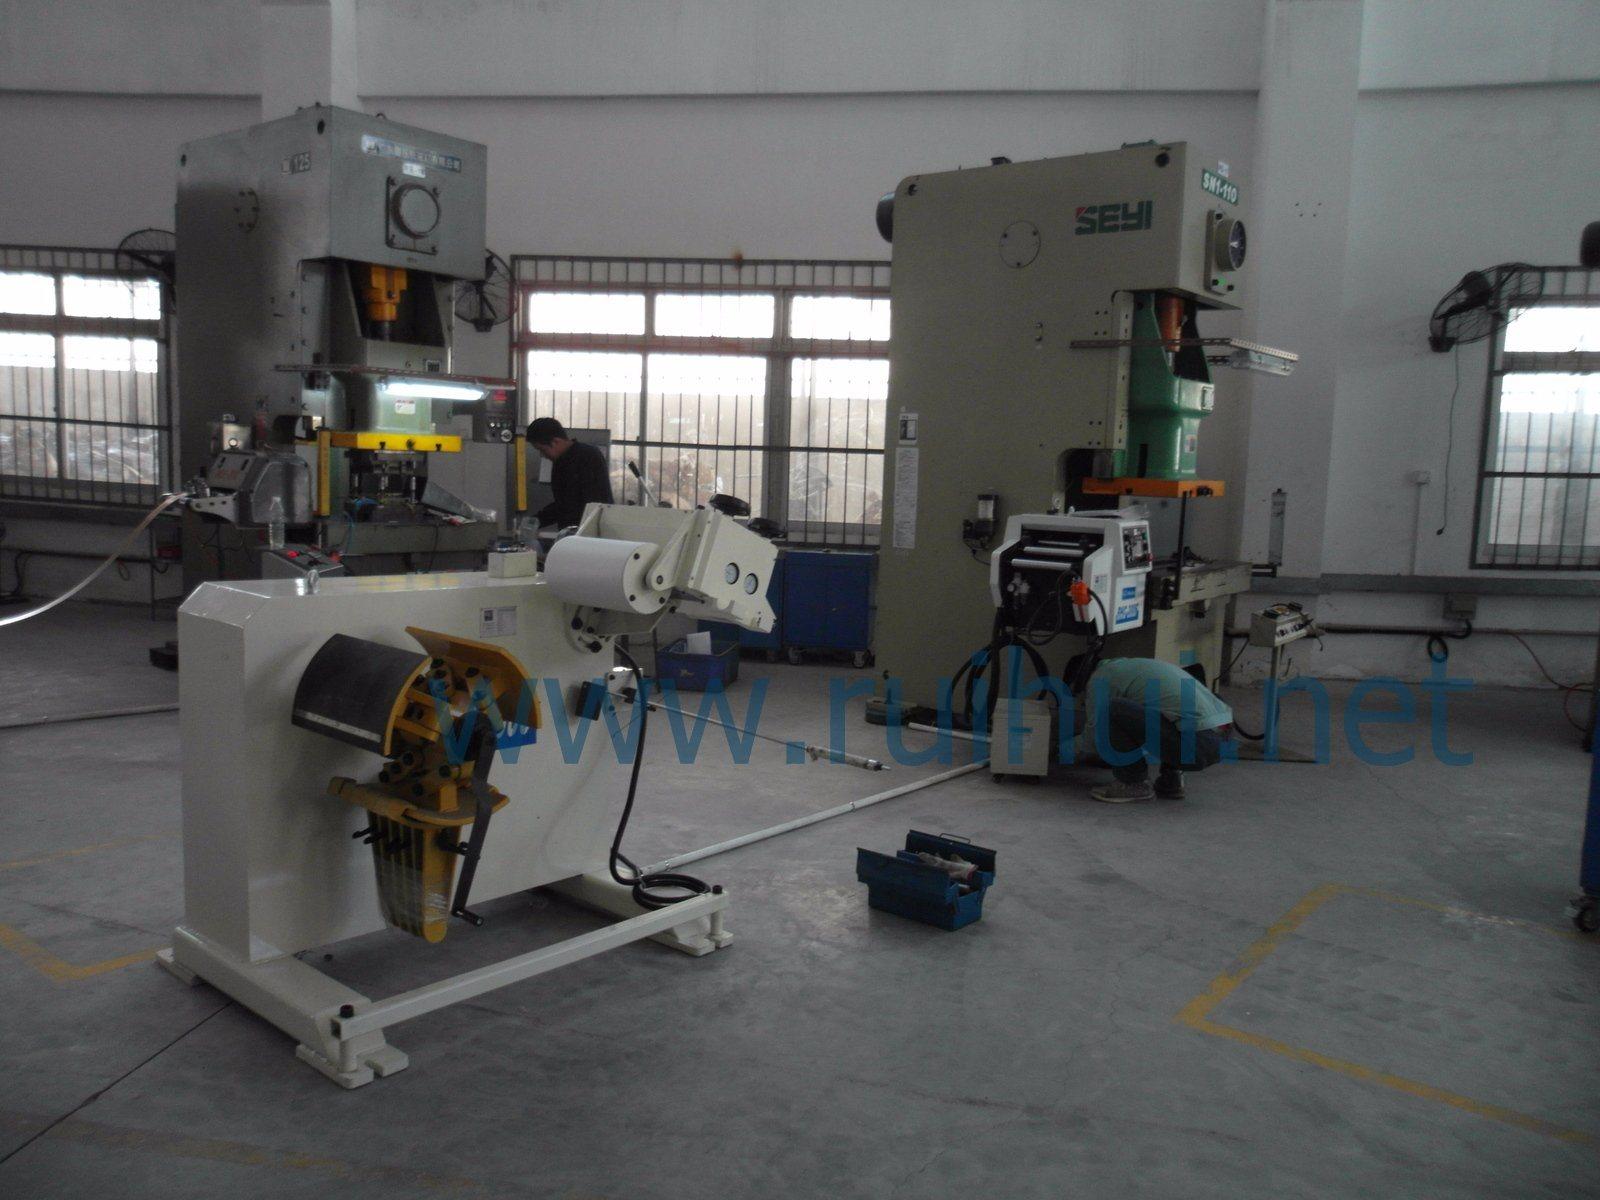 China Supplier 0.3-3.2mm Material Uncoiler with Straightener Make Strip Straightening